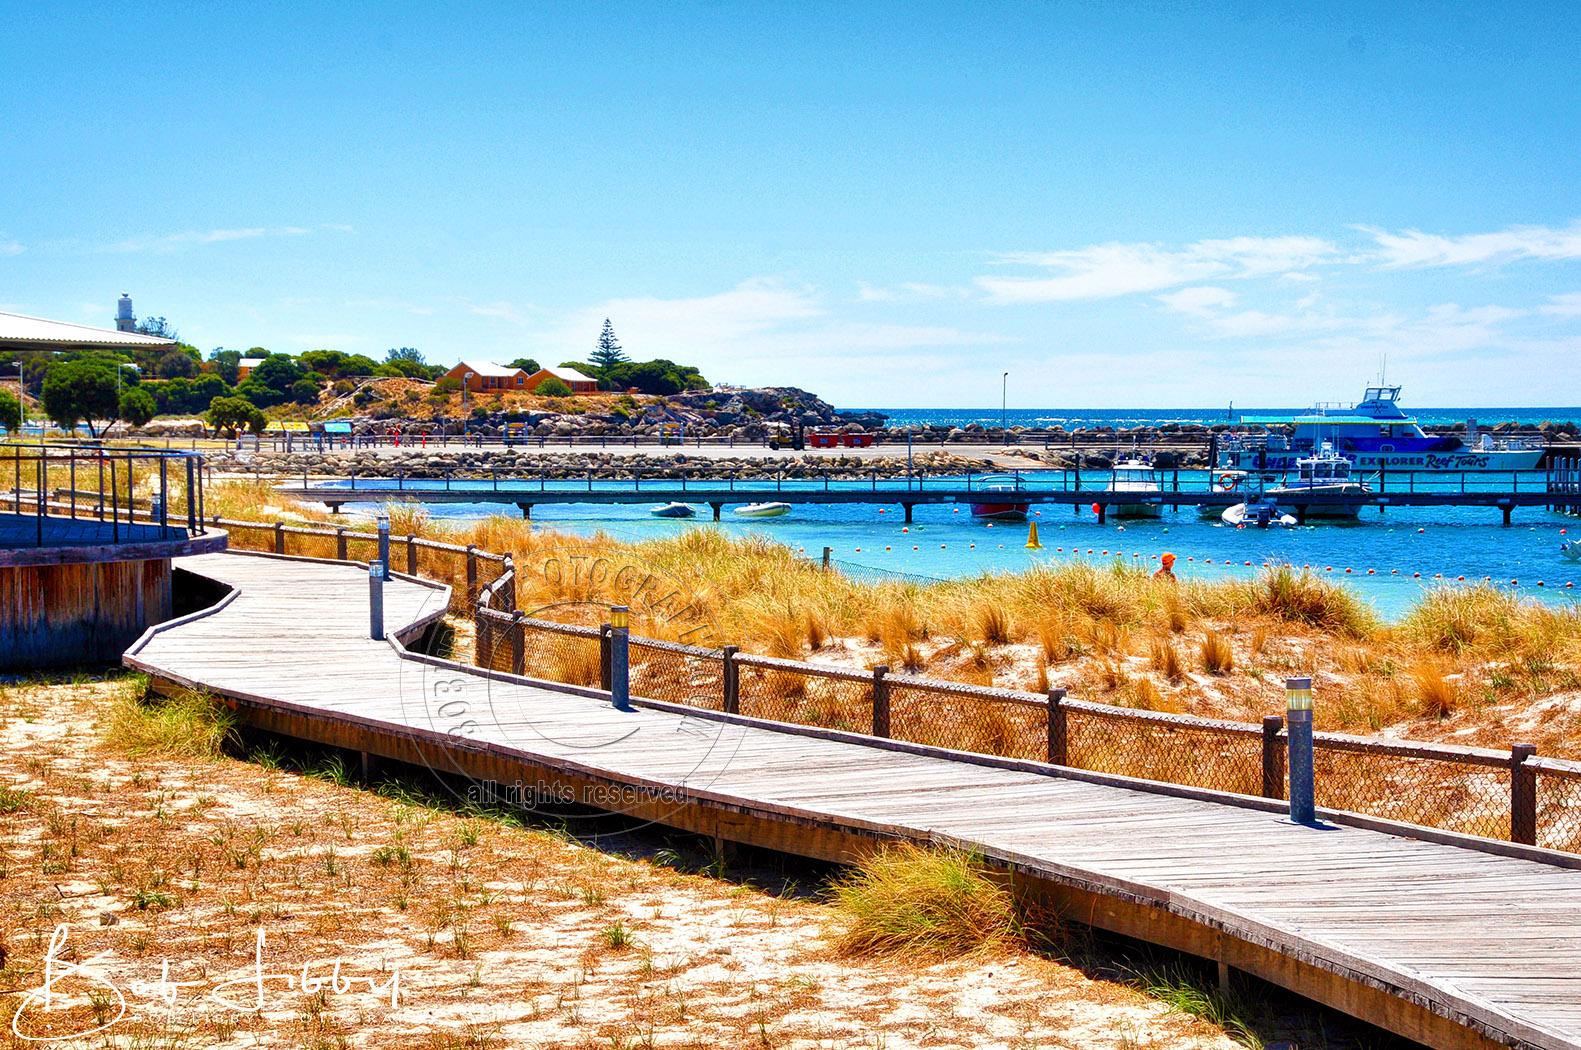 https://boblibbyphotography.com/wp-content/uploads/2015/12/Rottnest-Island-Western-Australia.jpg